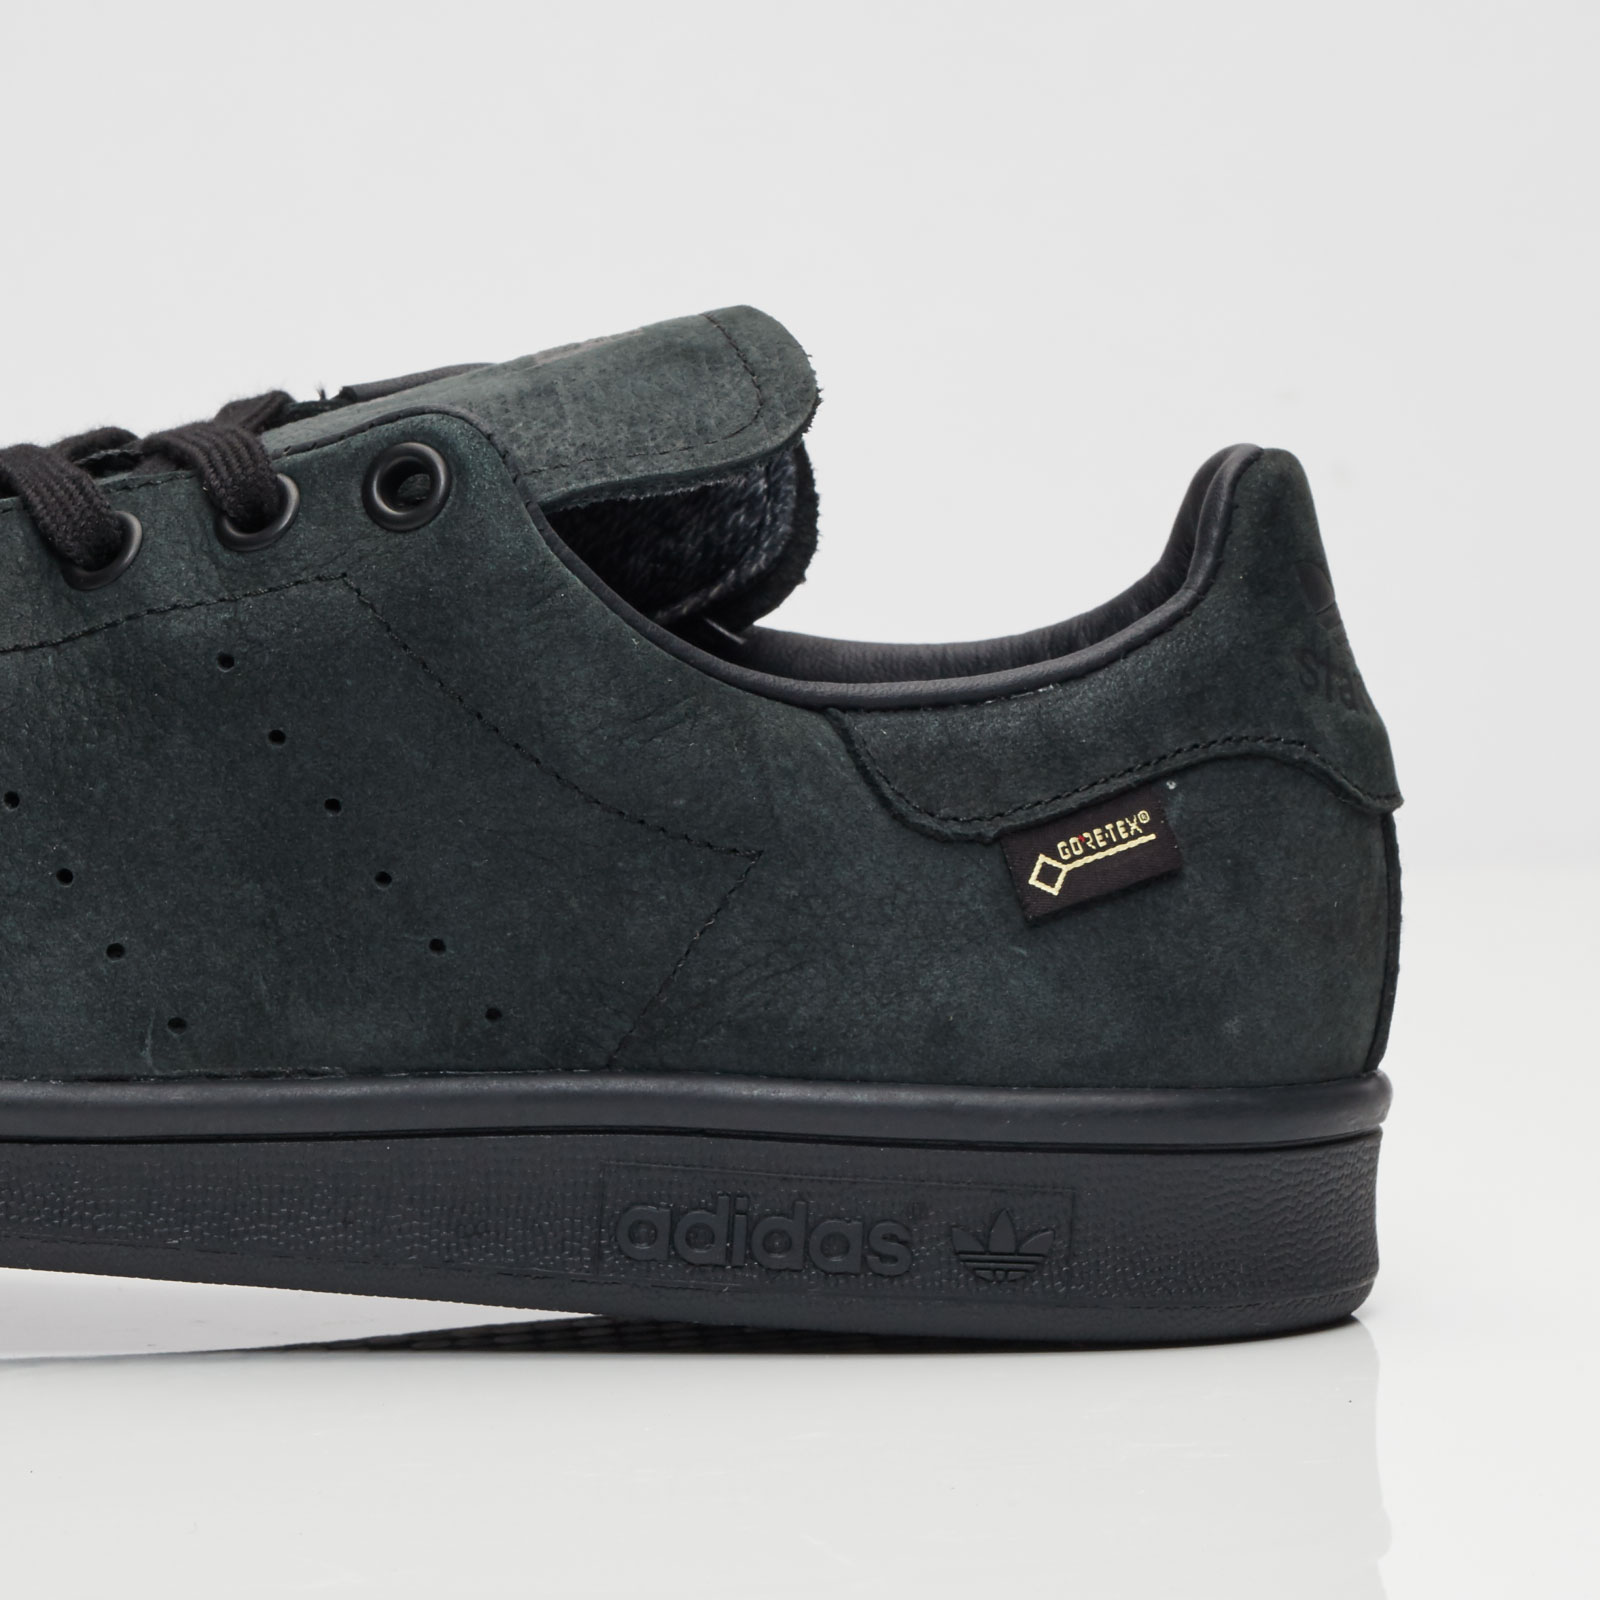 863b02350ca adidas Stan Smith GTX - S80048 - Sneakersnstuff